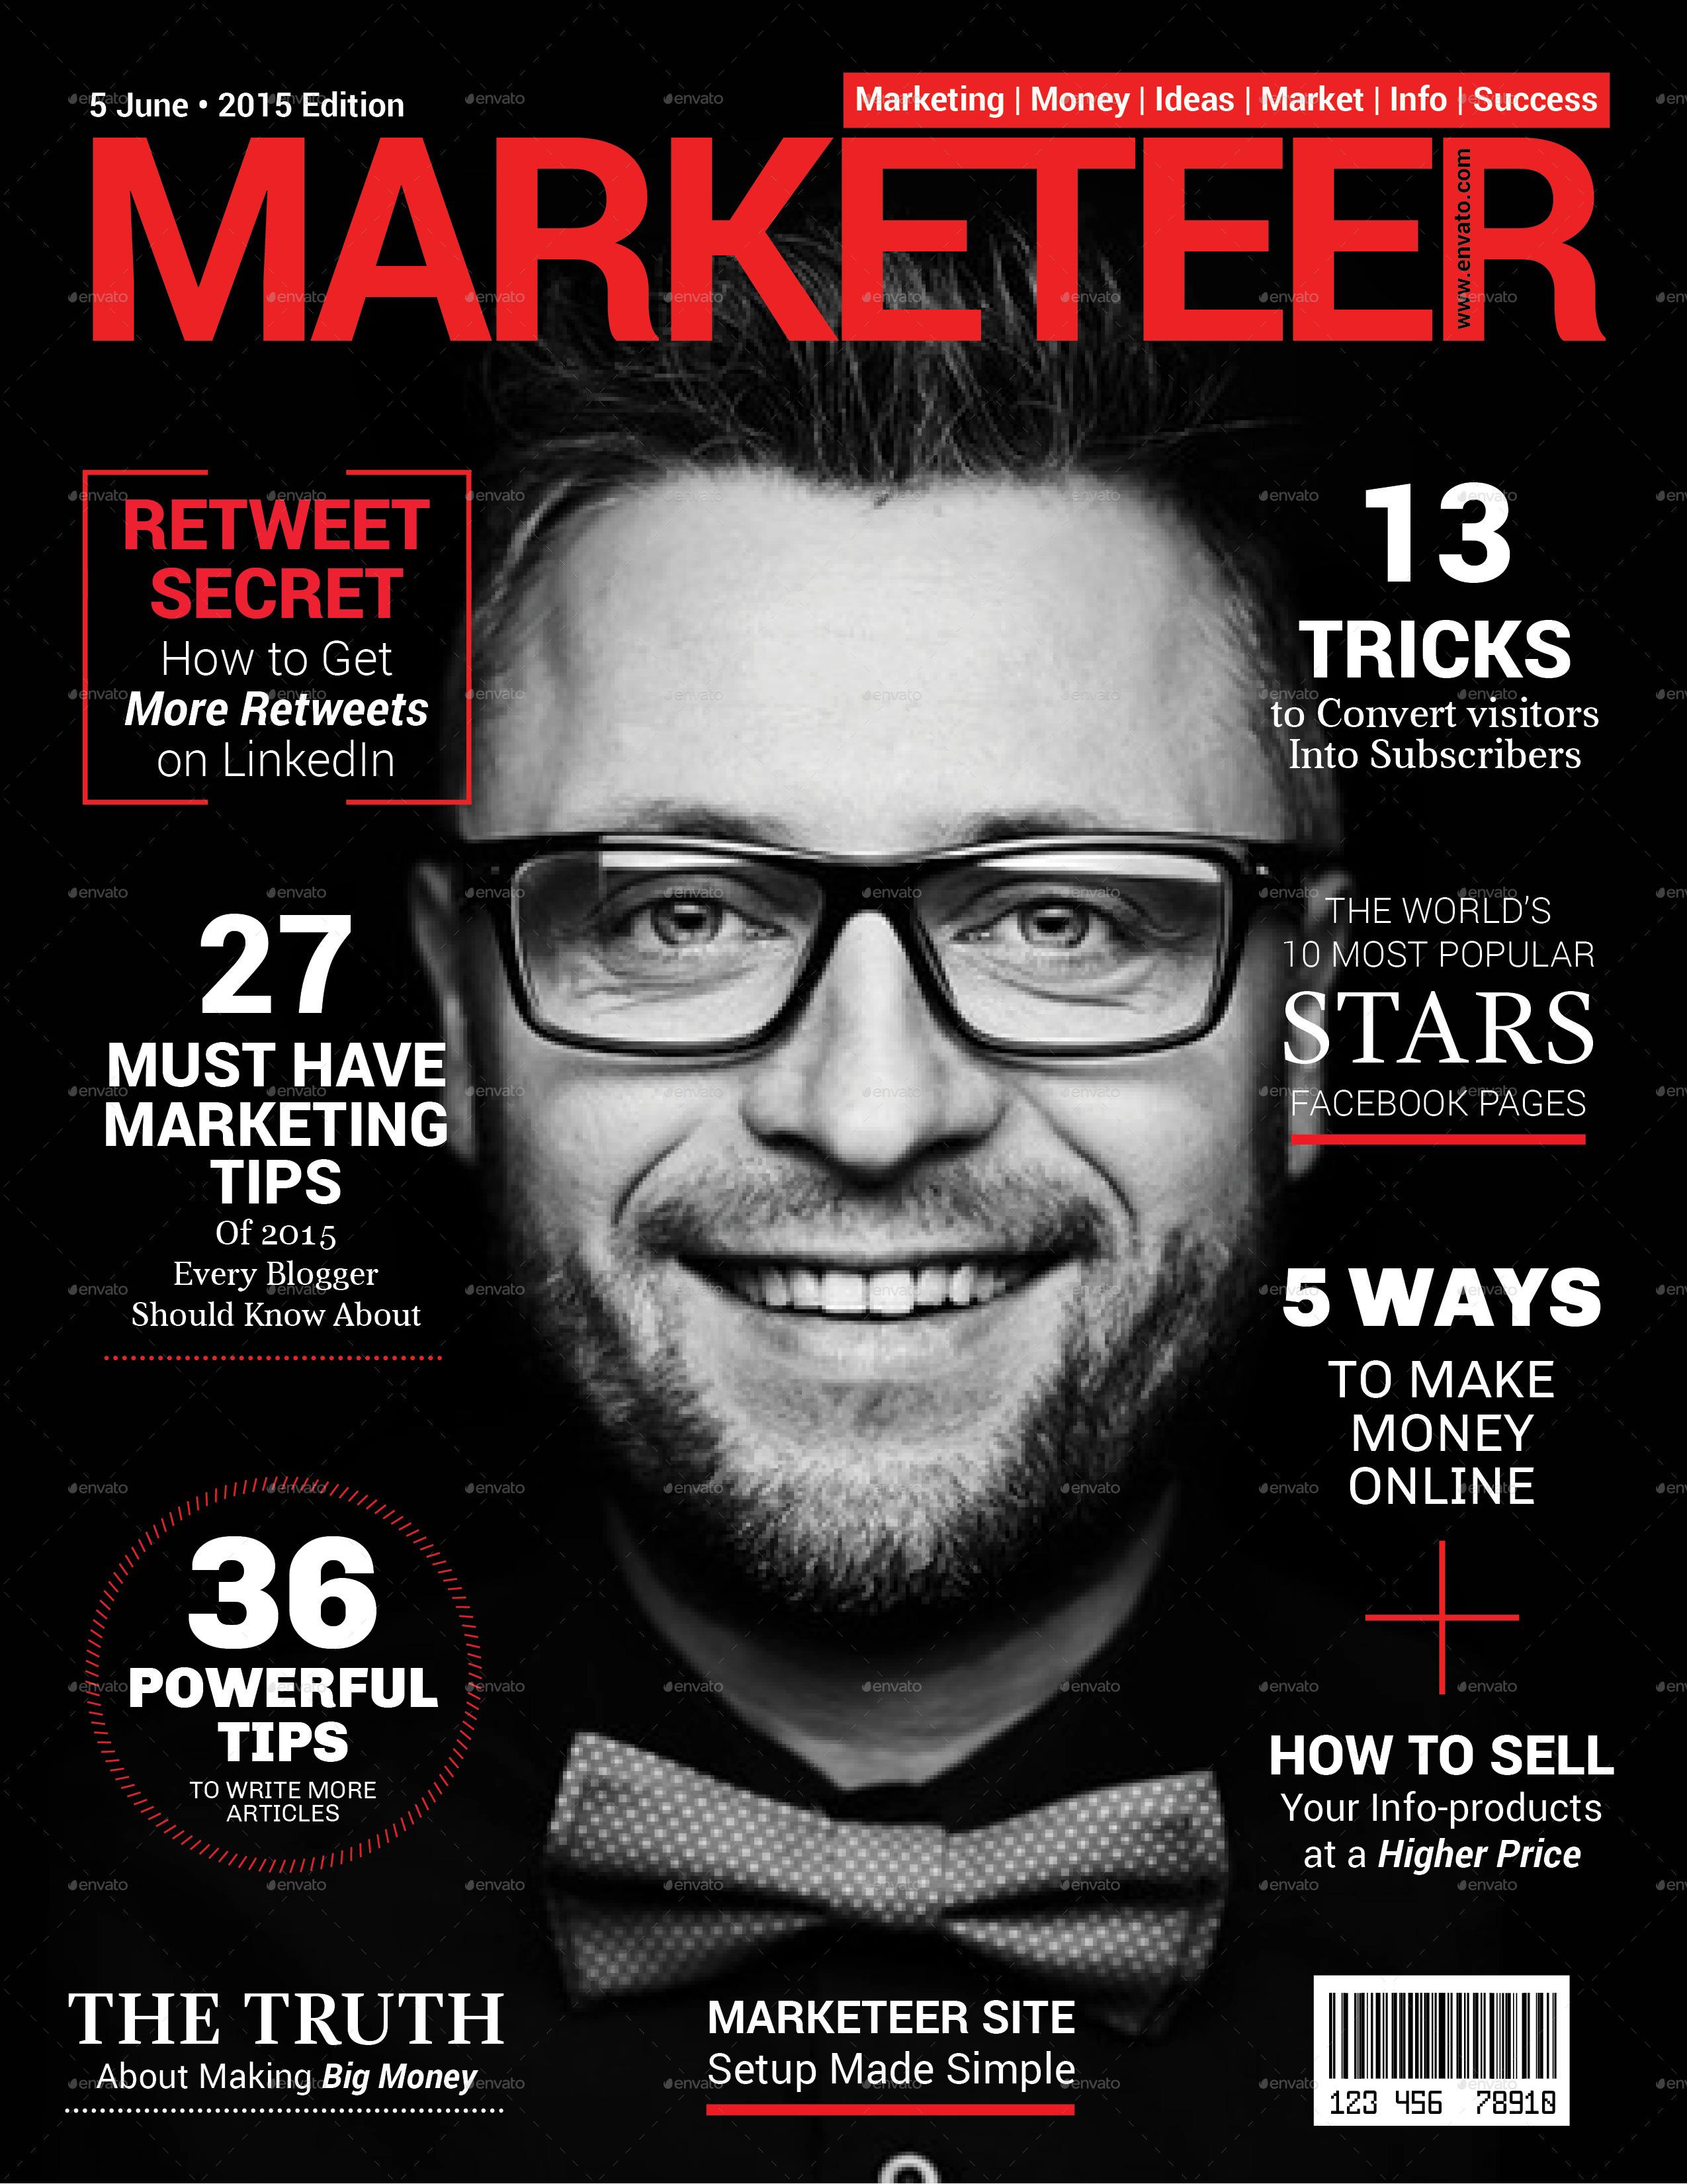 marketing magazine cover by victorlopatin